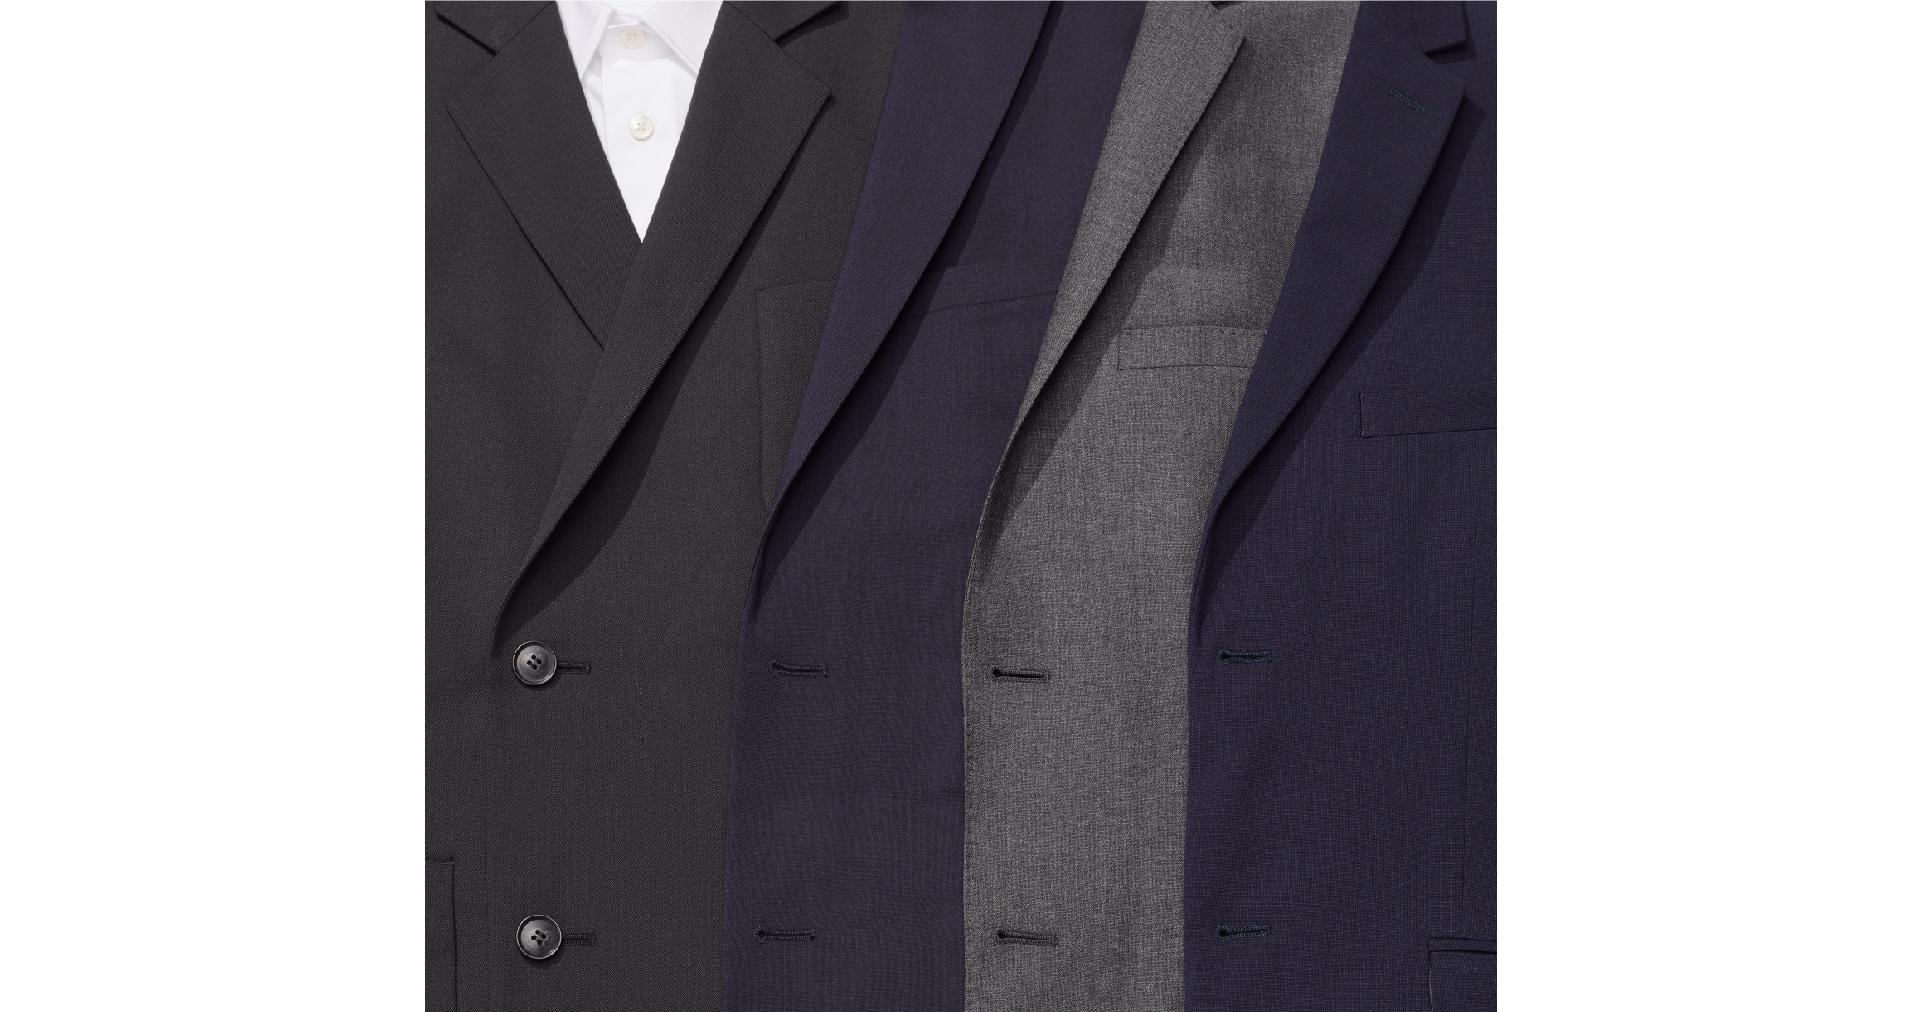 5f2b68726f38 Klädkod: Kavaj | Dam & Herr - Afound